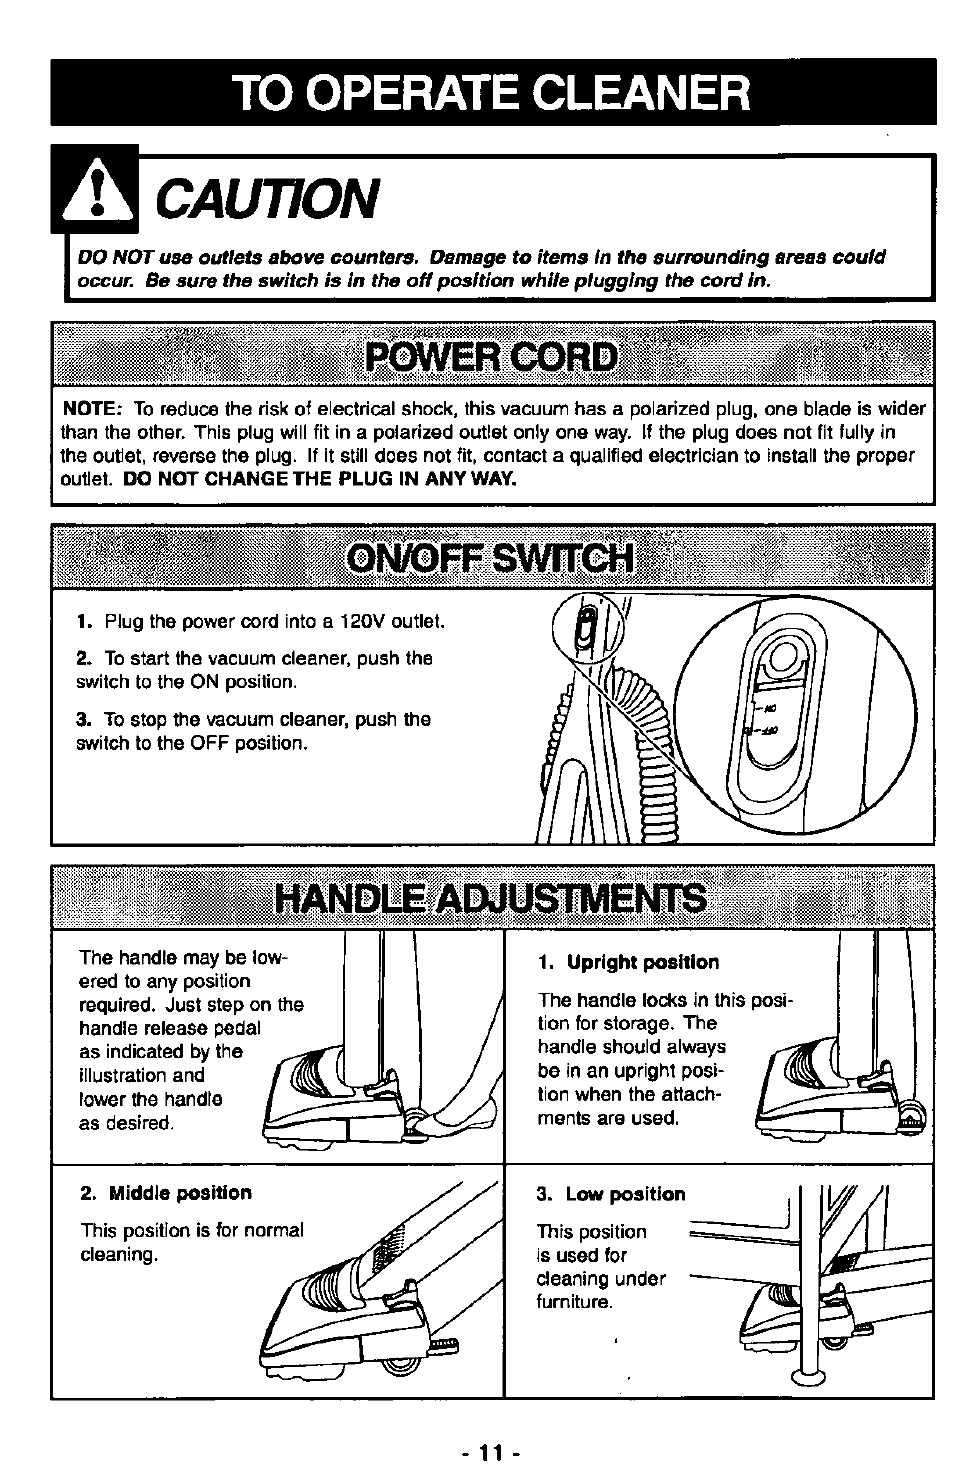 to operate cleaner on off switch upright position panasonic mc rh manualsdir com Panasonic Cordless Phone KX-TG155SK User Manual Panasonic Cordless Phone KX-TG155SK User Manual